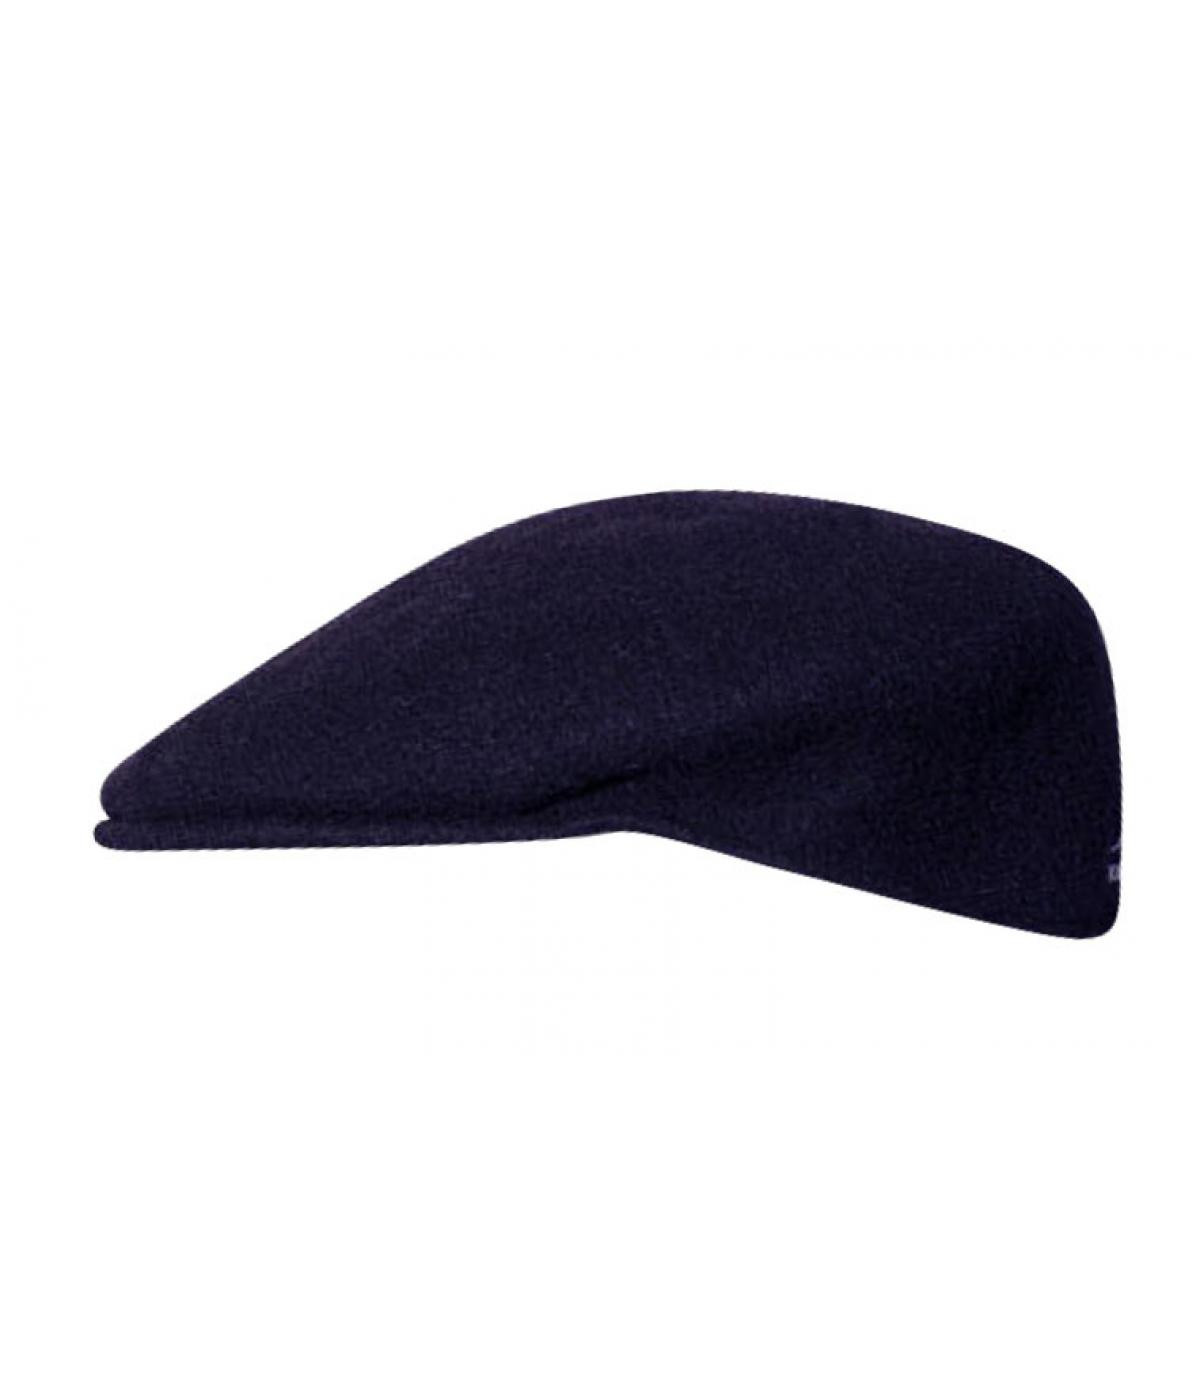 Détails 504 wool navy - image 2